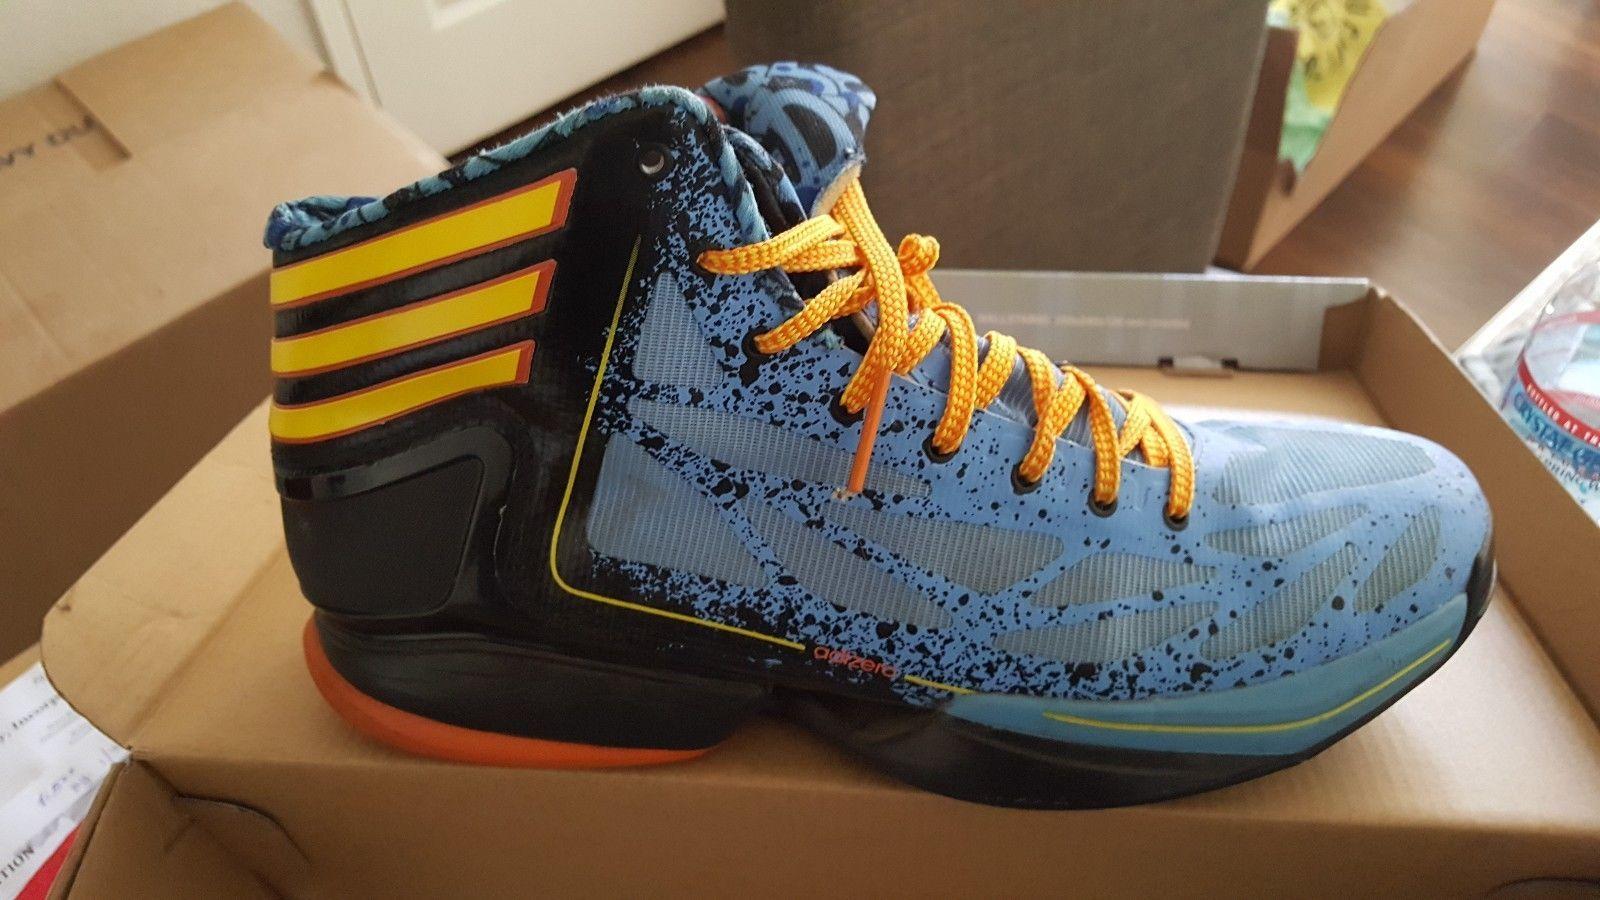 Adidas Adizero Crazy Light 2 Basketball and 11 similar items 1a52d7f2d